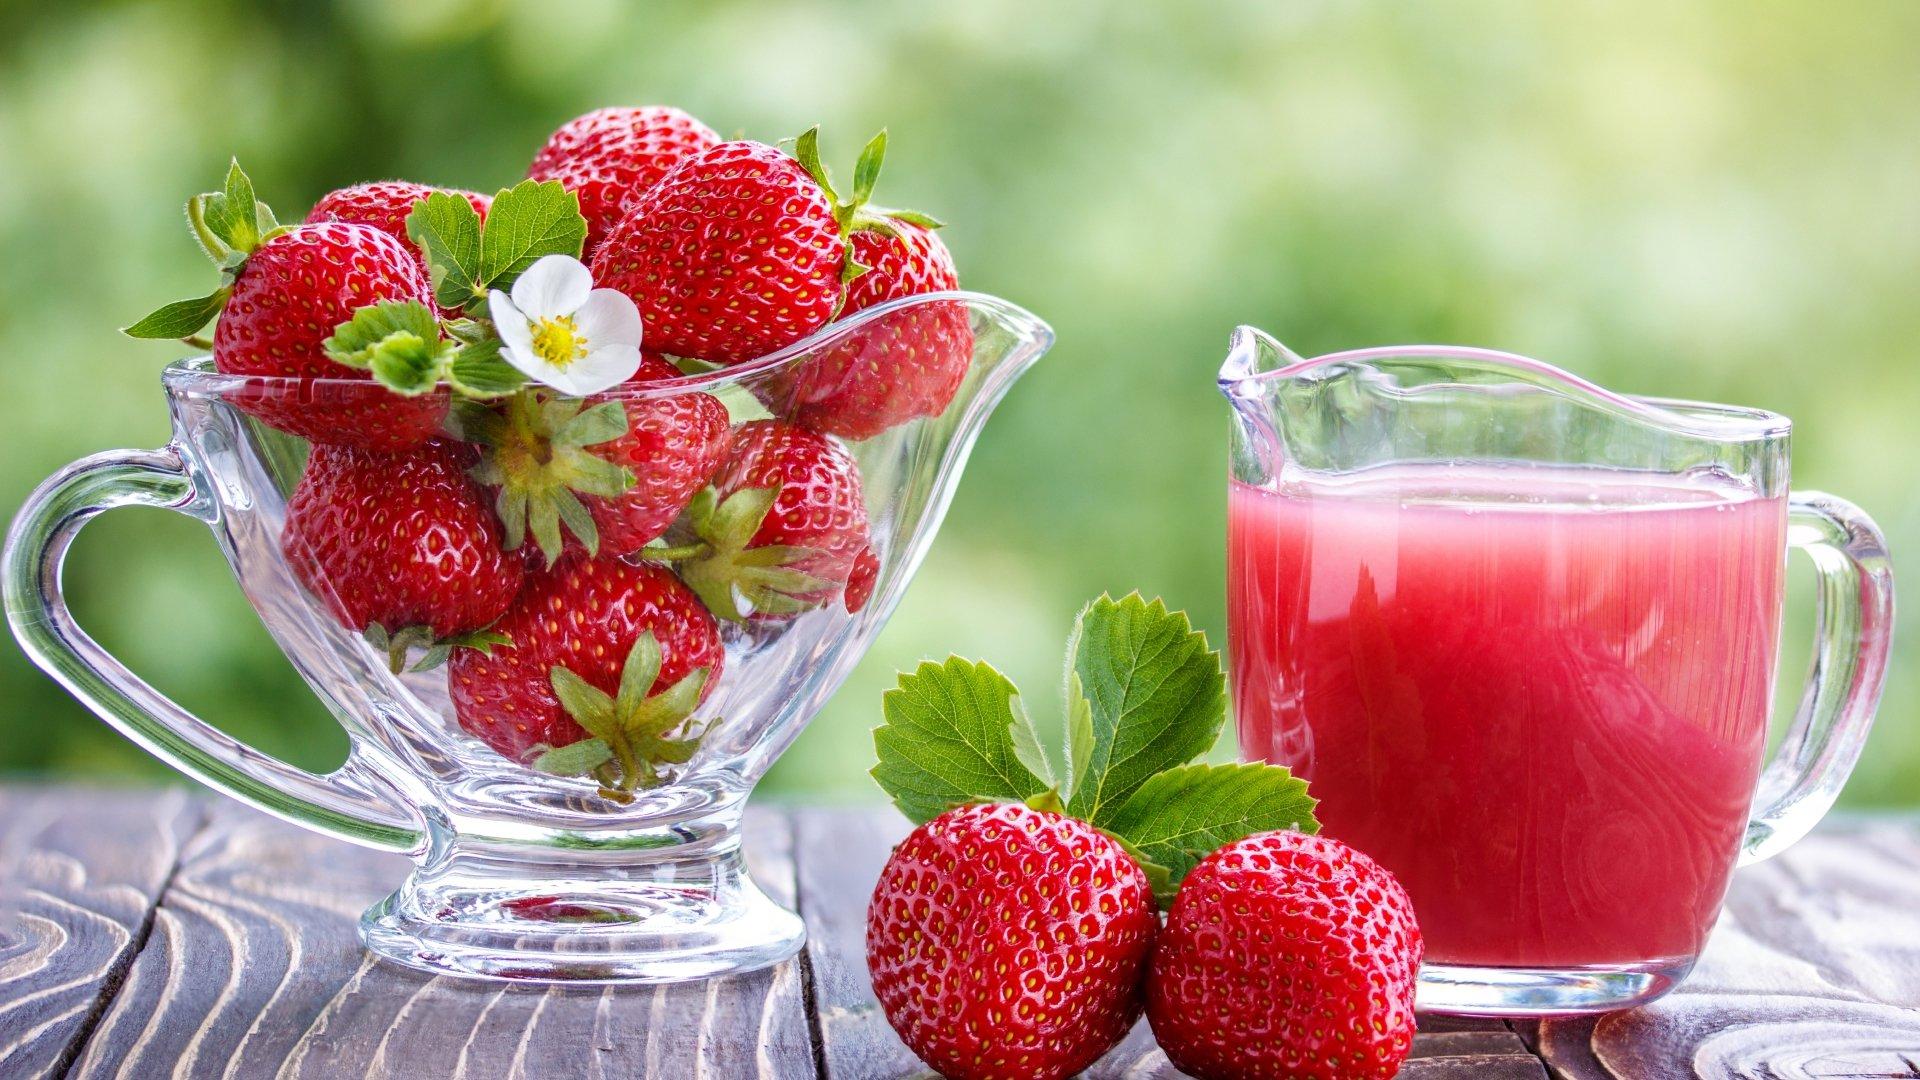 Strawberry 8k Ultra HD Wallpaper